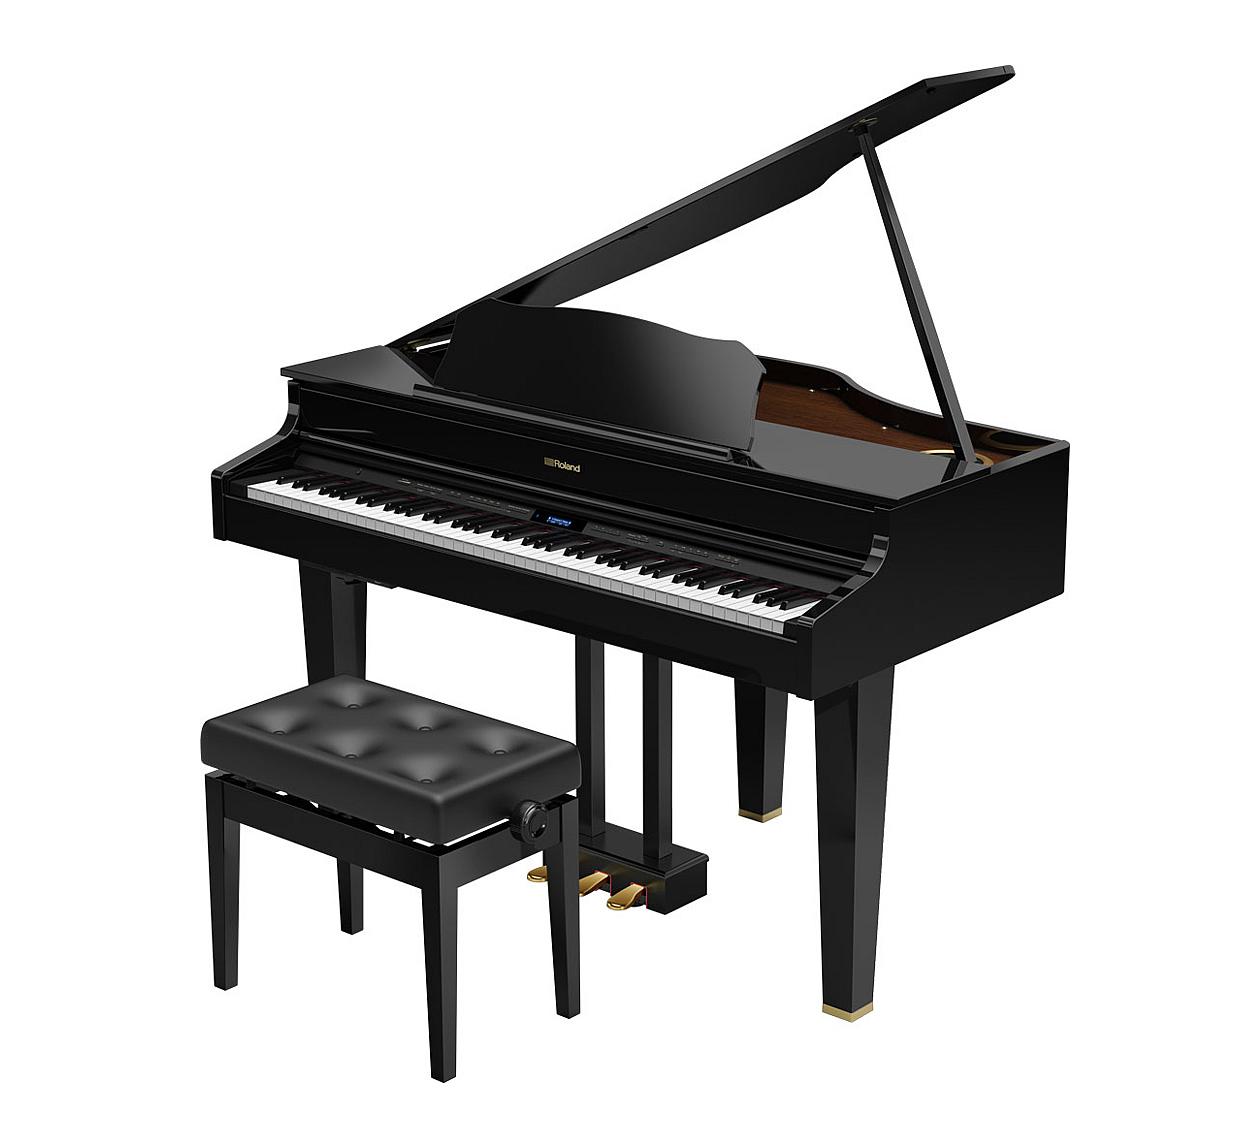 Main Gallery Image: Roland GP607 digital grand piano.